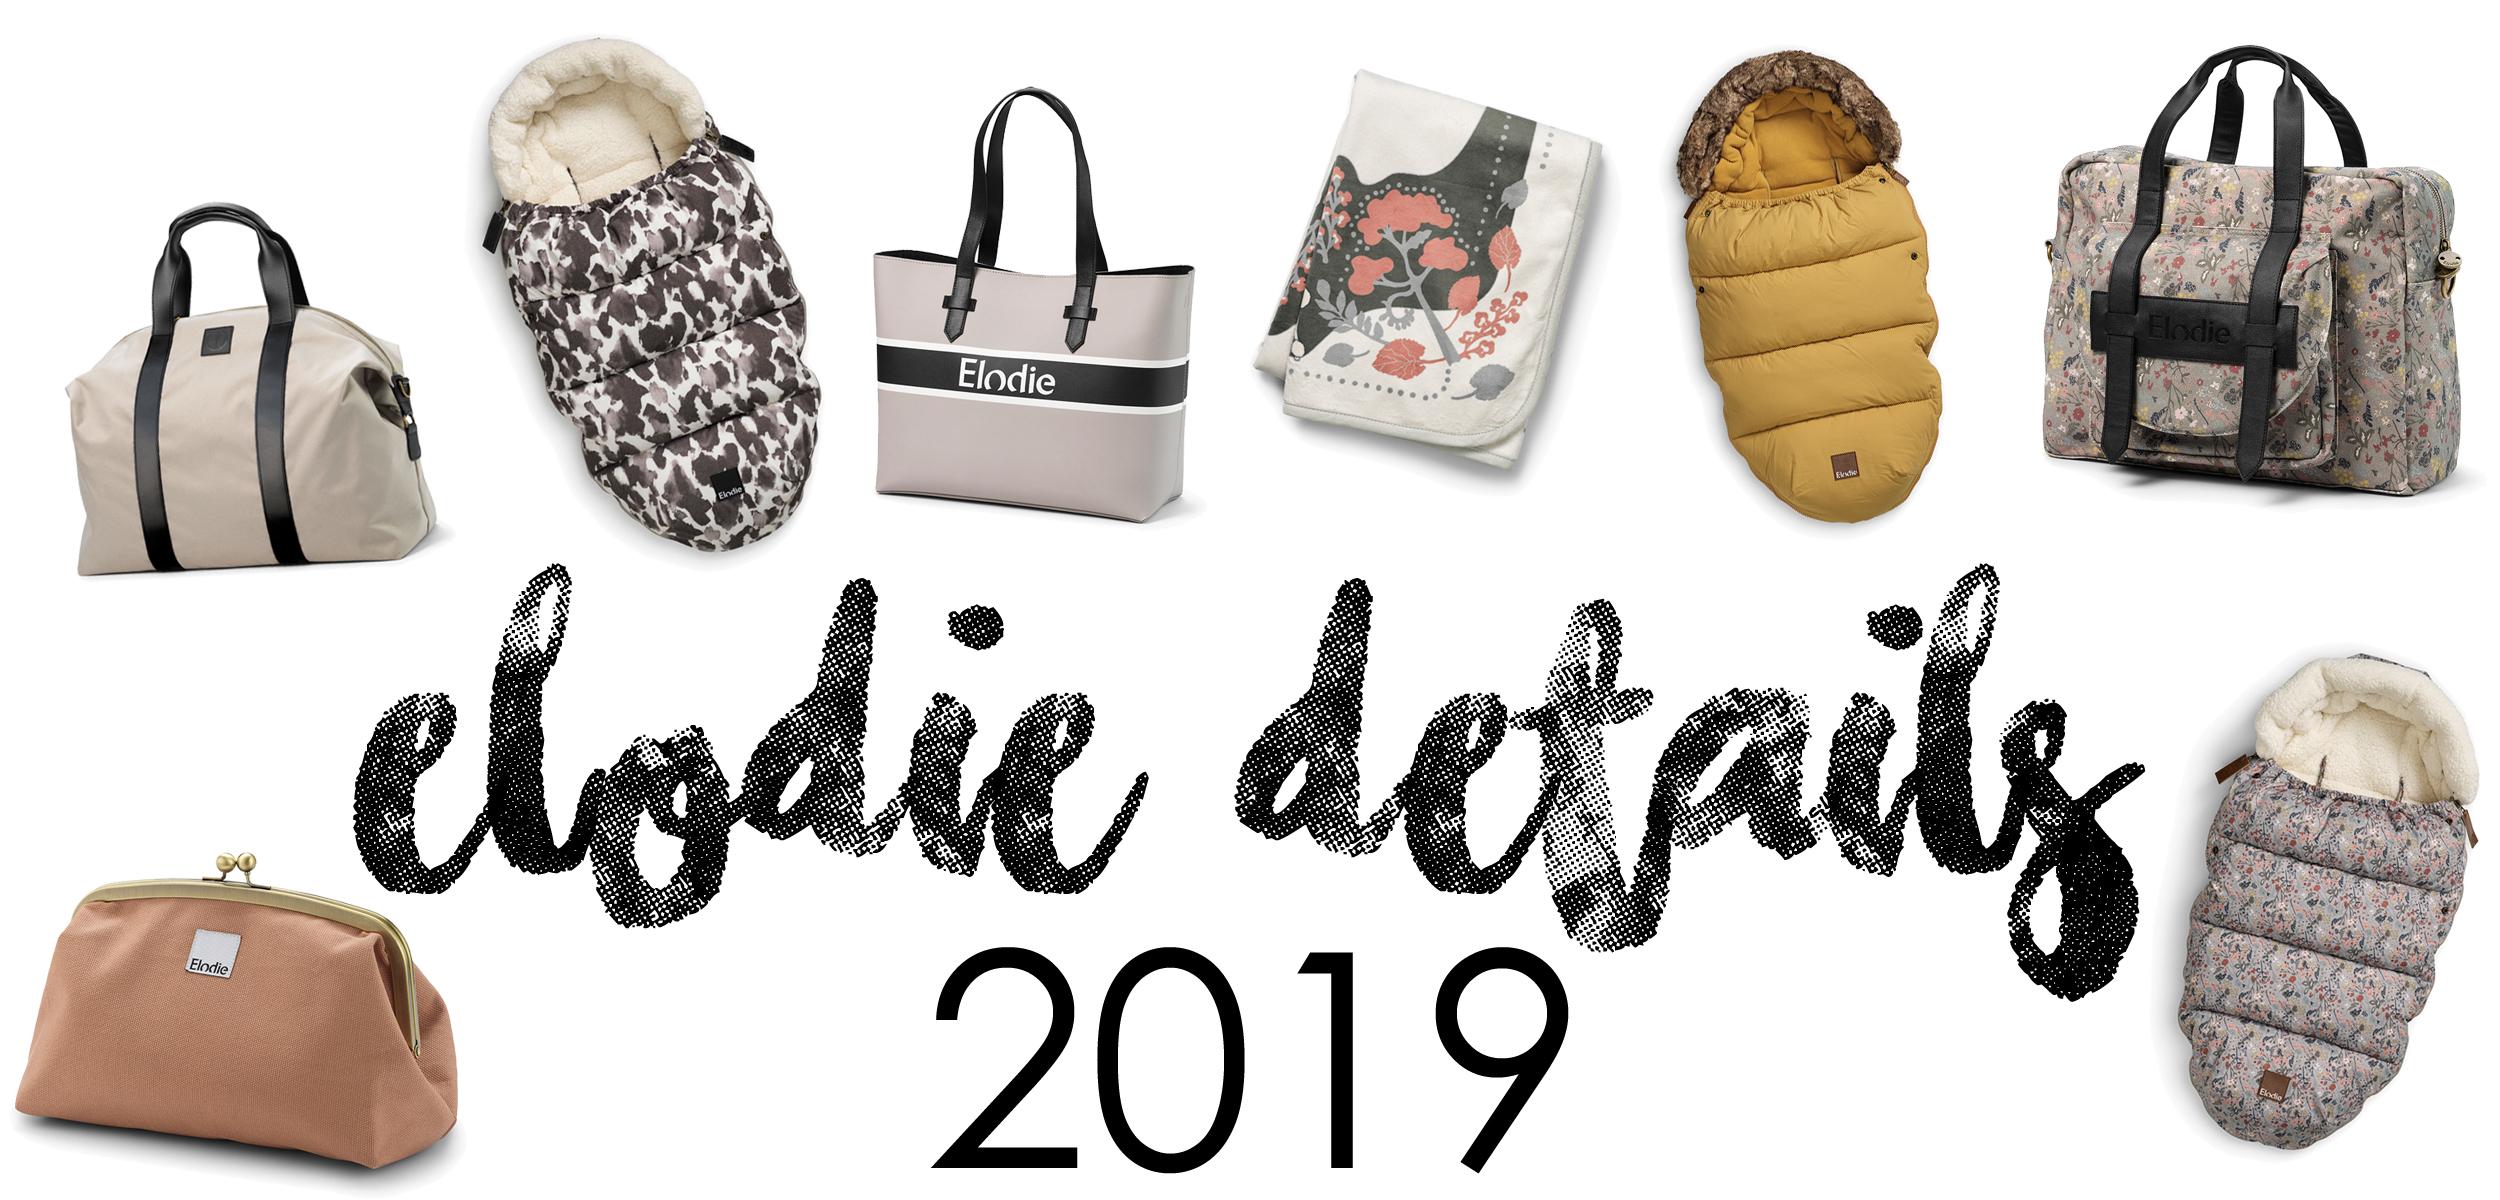 Elodie Details 2019 - åkpåsar och skötväskor